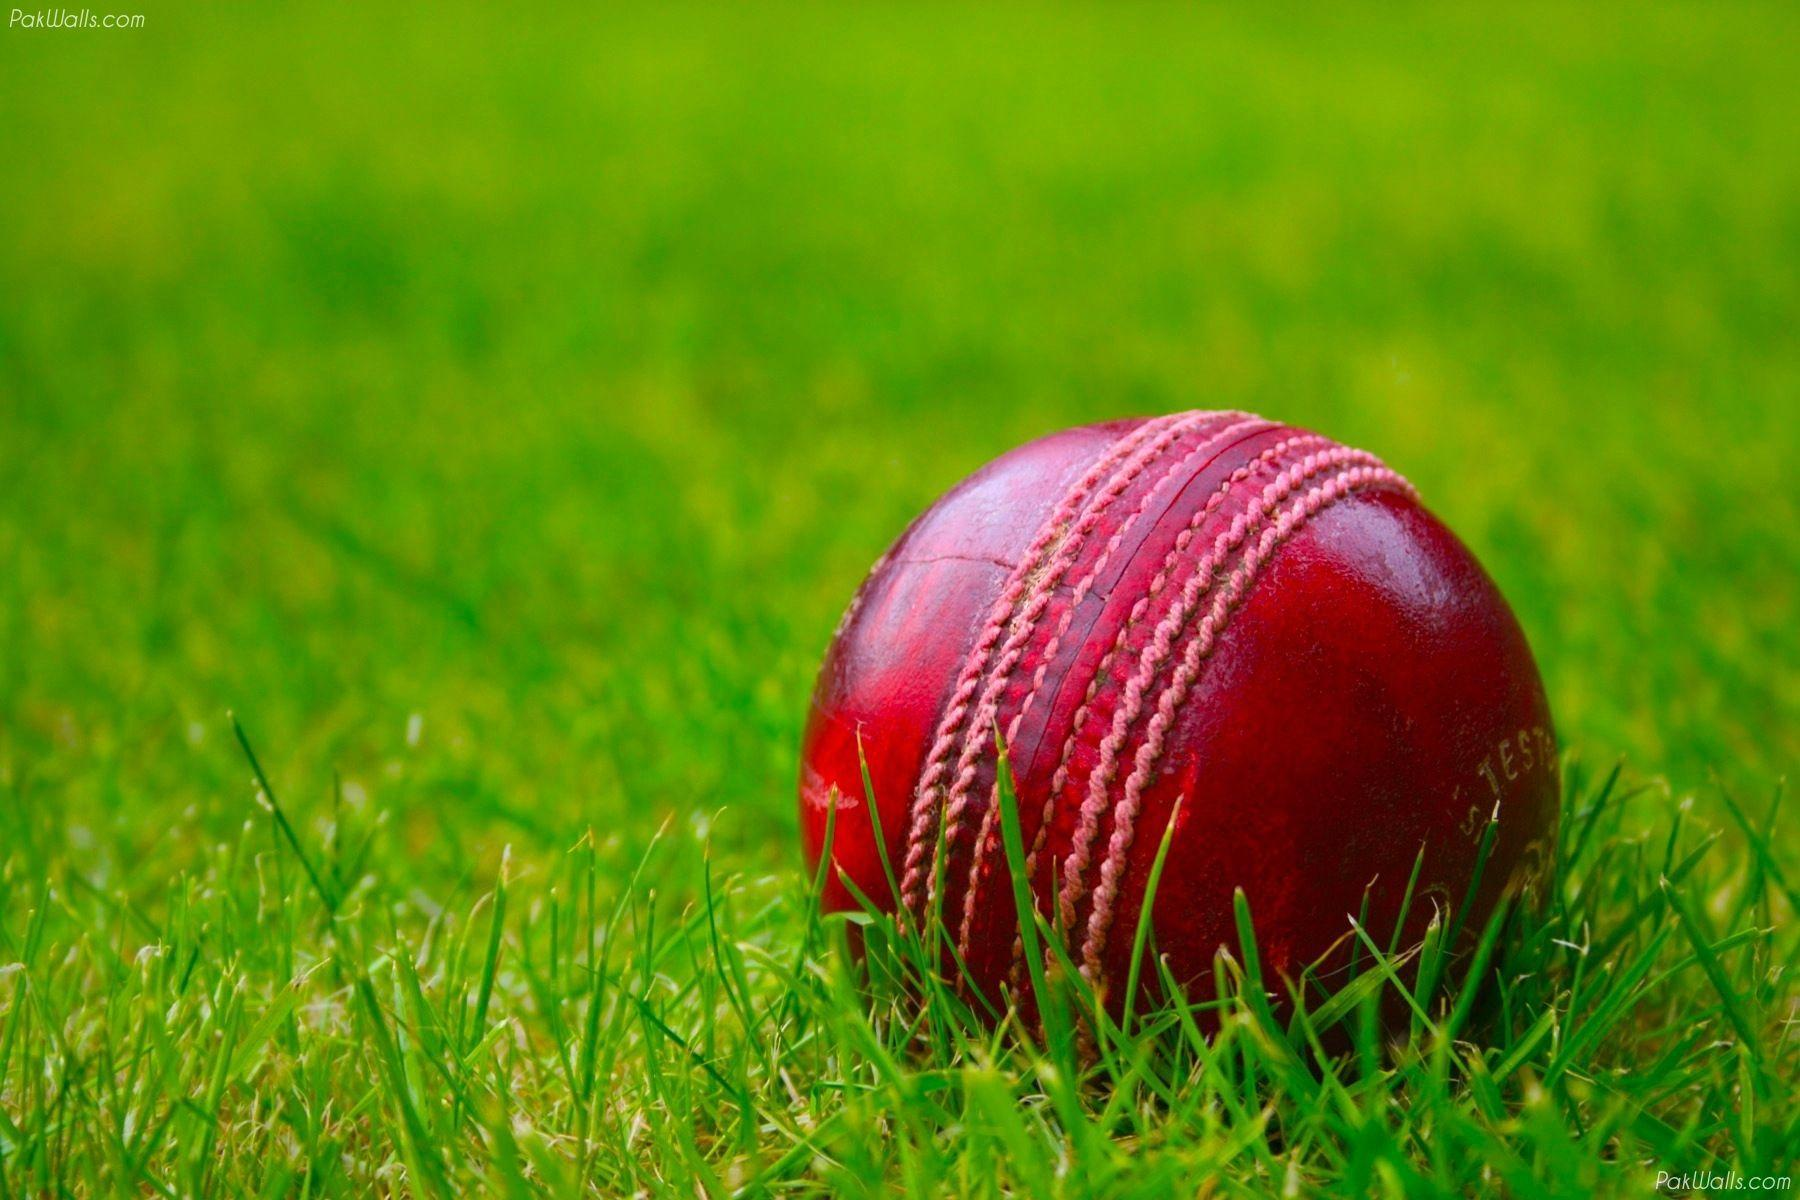 Cricket Wallpapers - Top Free Cricket